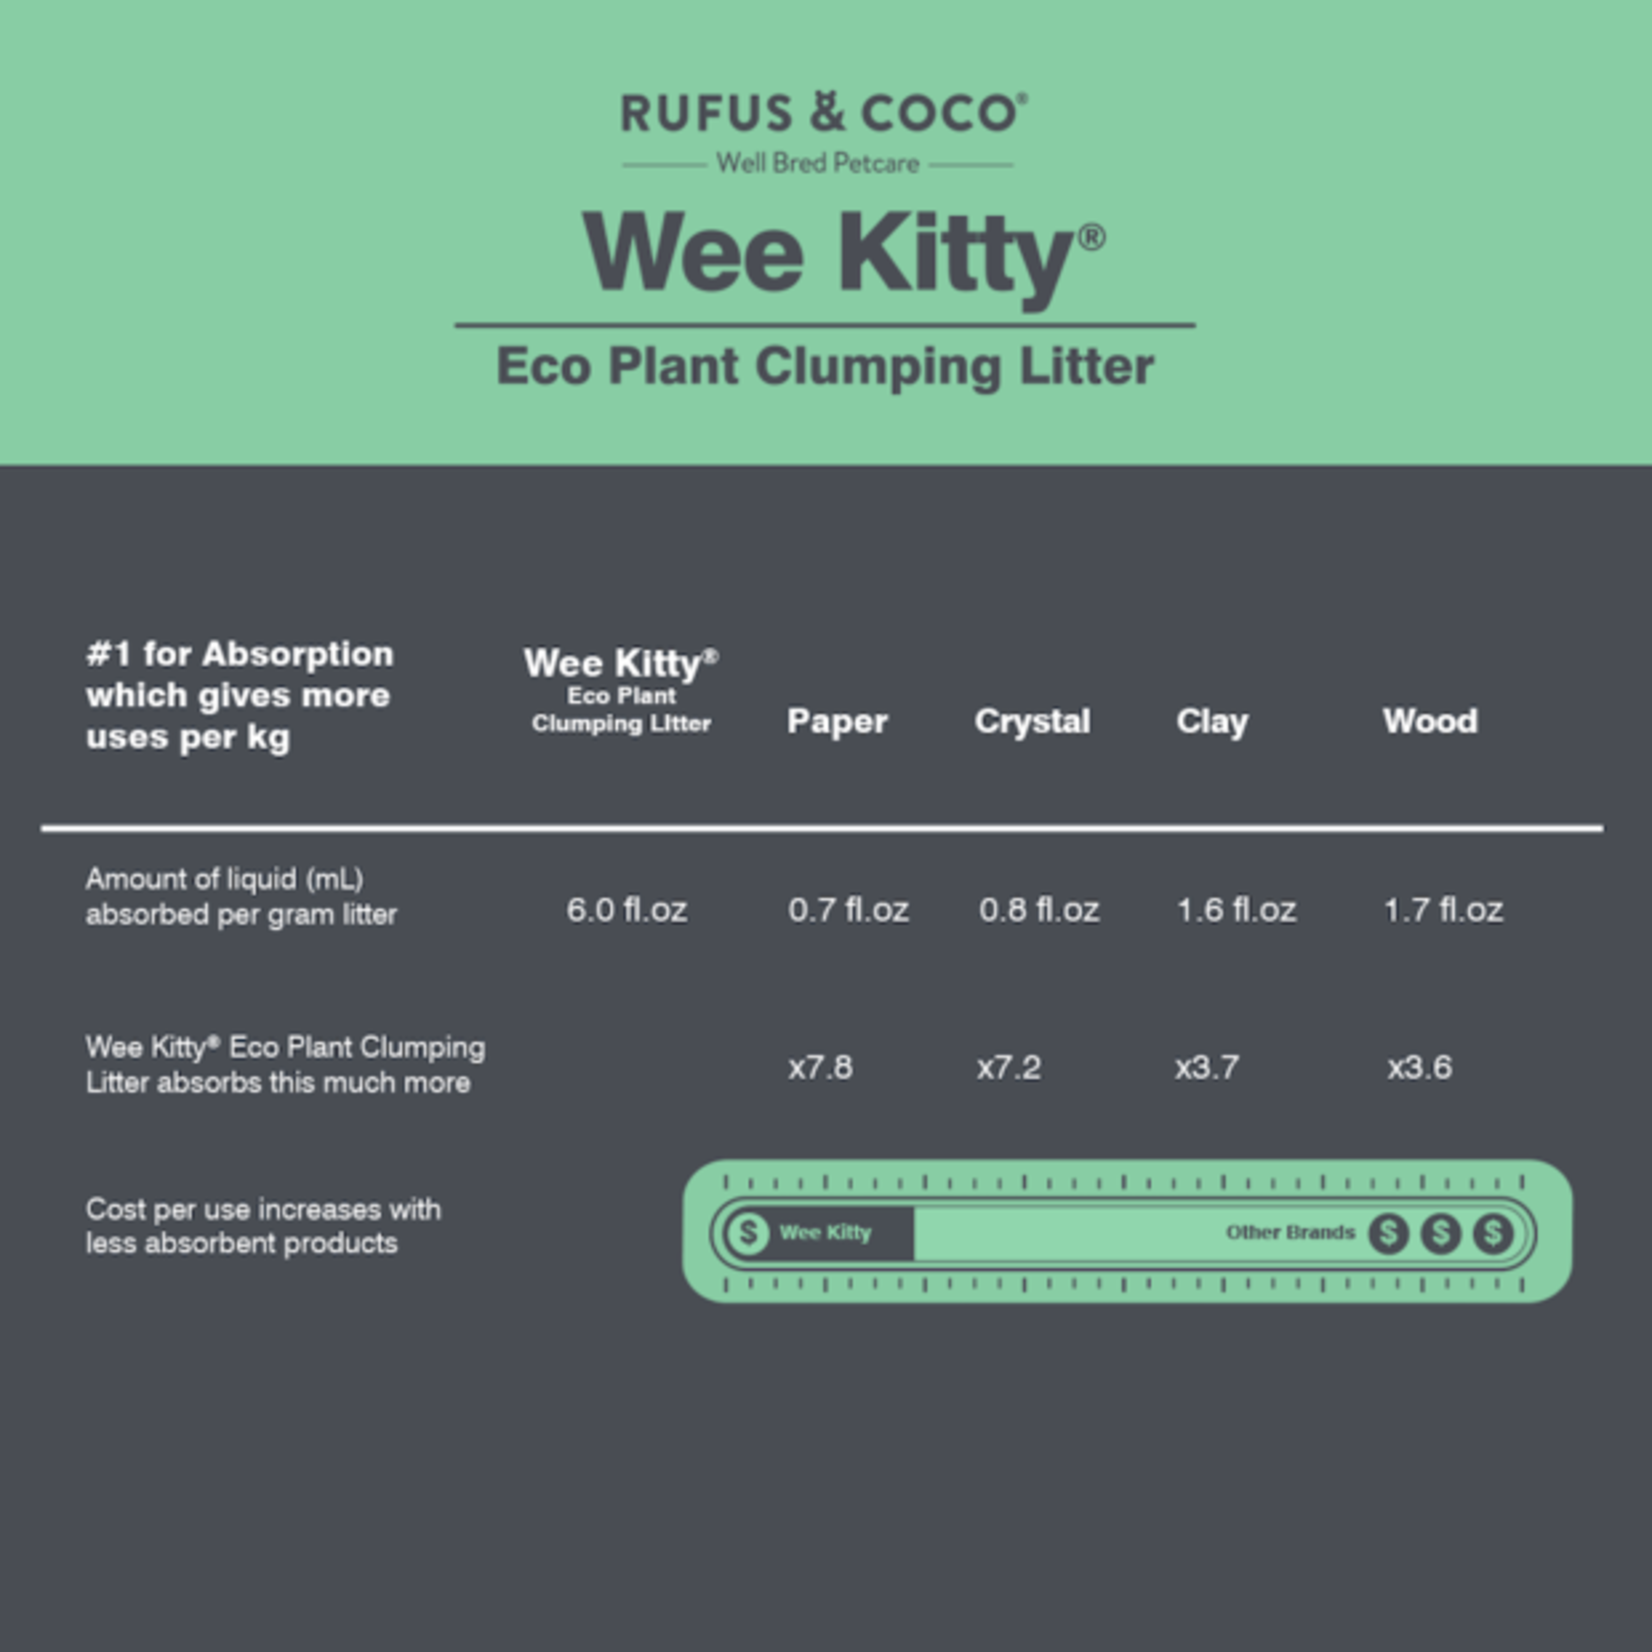 Rufus & Coco Soybean Fibers Cat litter- Clumping - Rufus & Coco 9kg